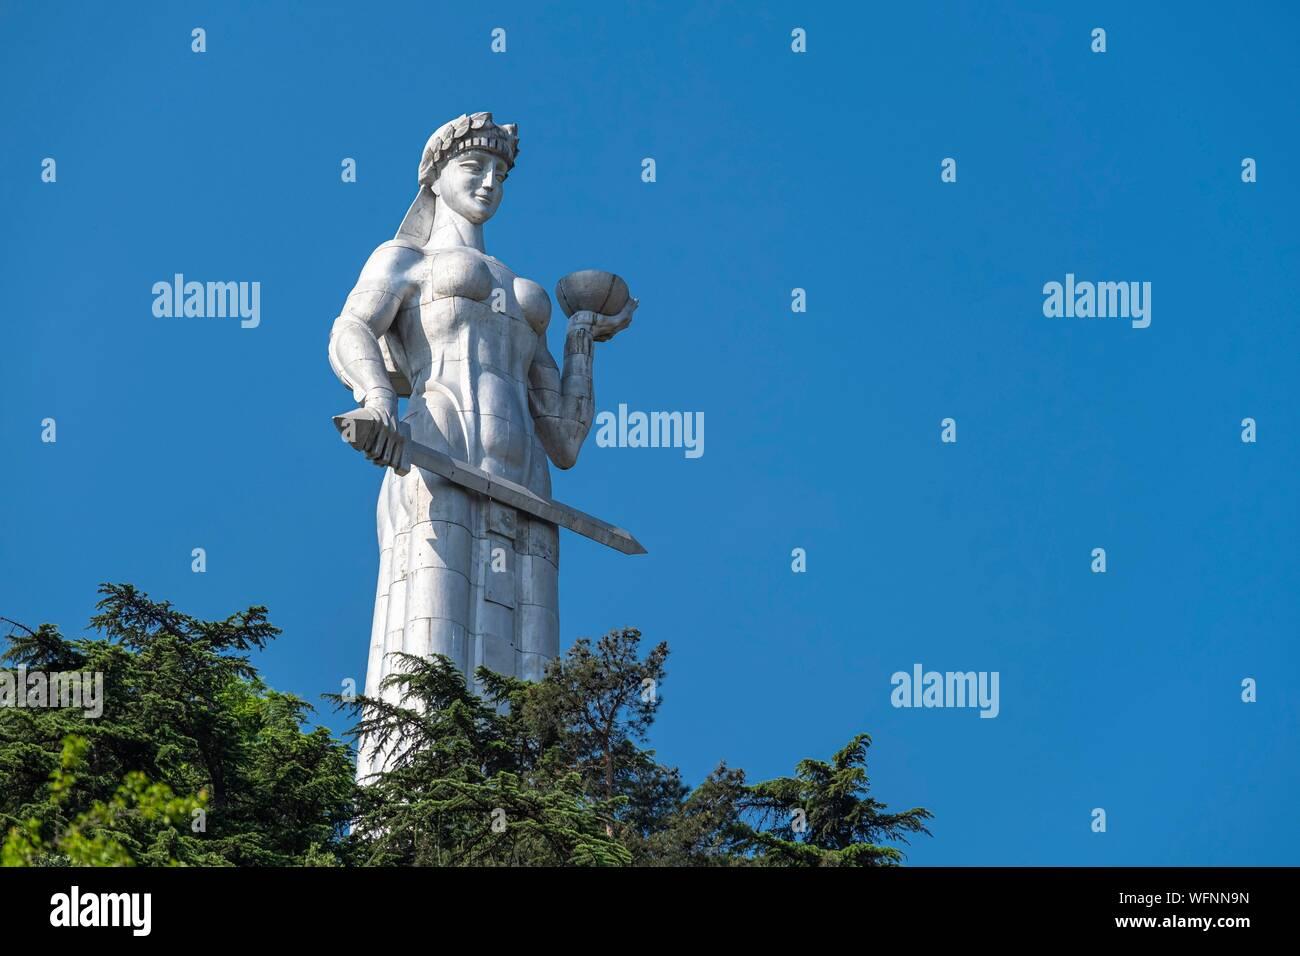 Georgia, Tbilisi, Kartlis Deda monument or Mother of Georgia on the top of the Sololaki hill is the symbol of Tbilisi Stock Photo